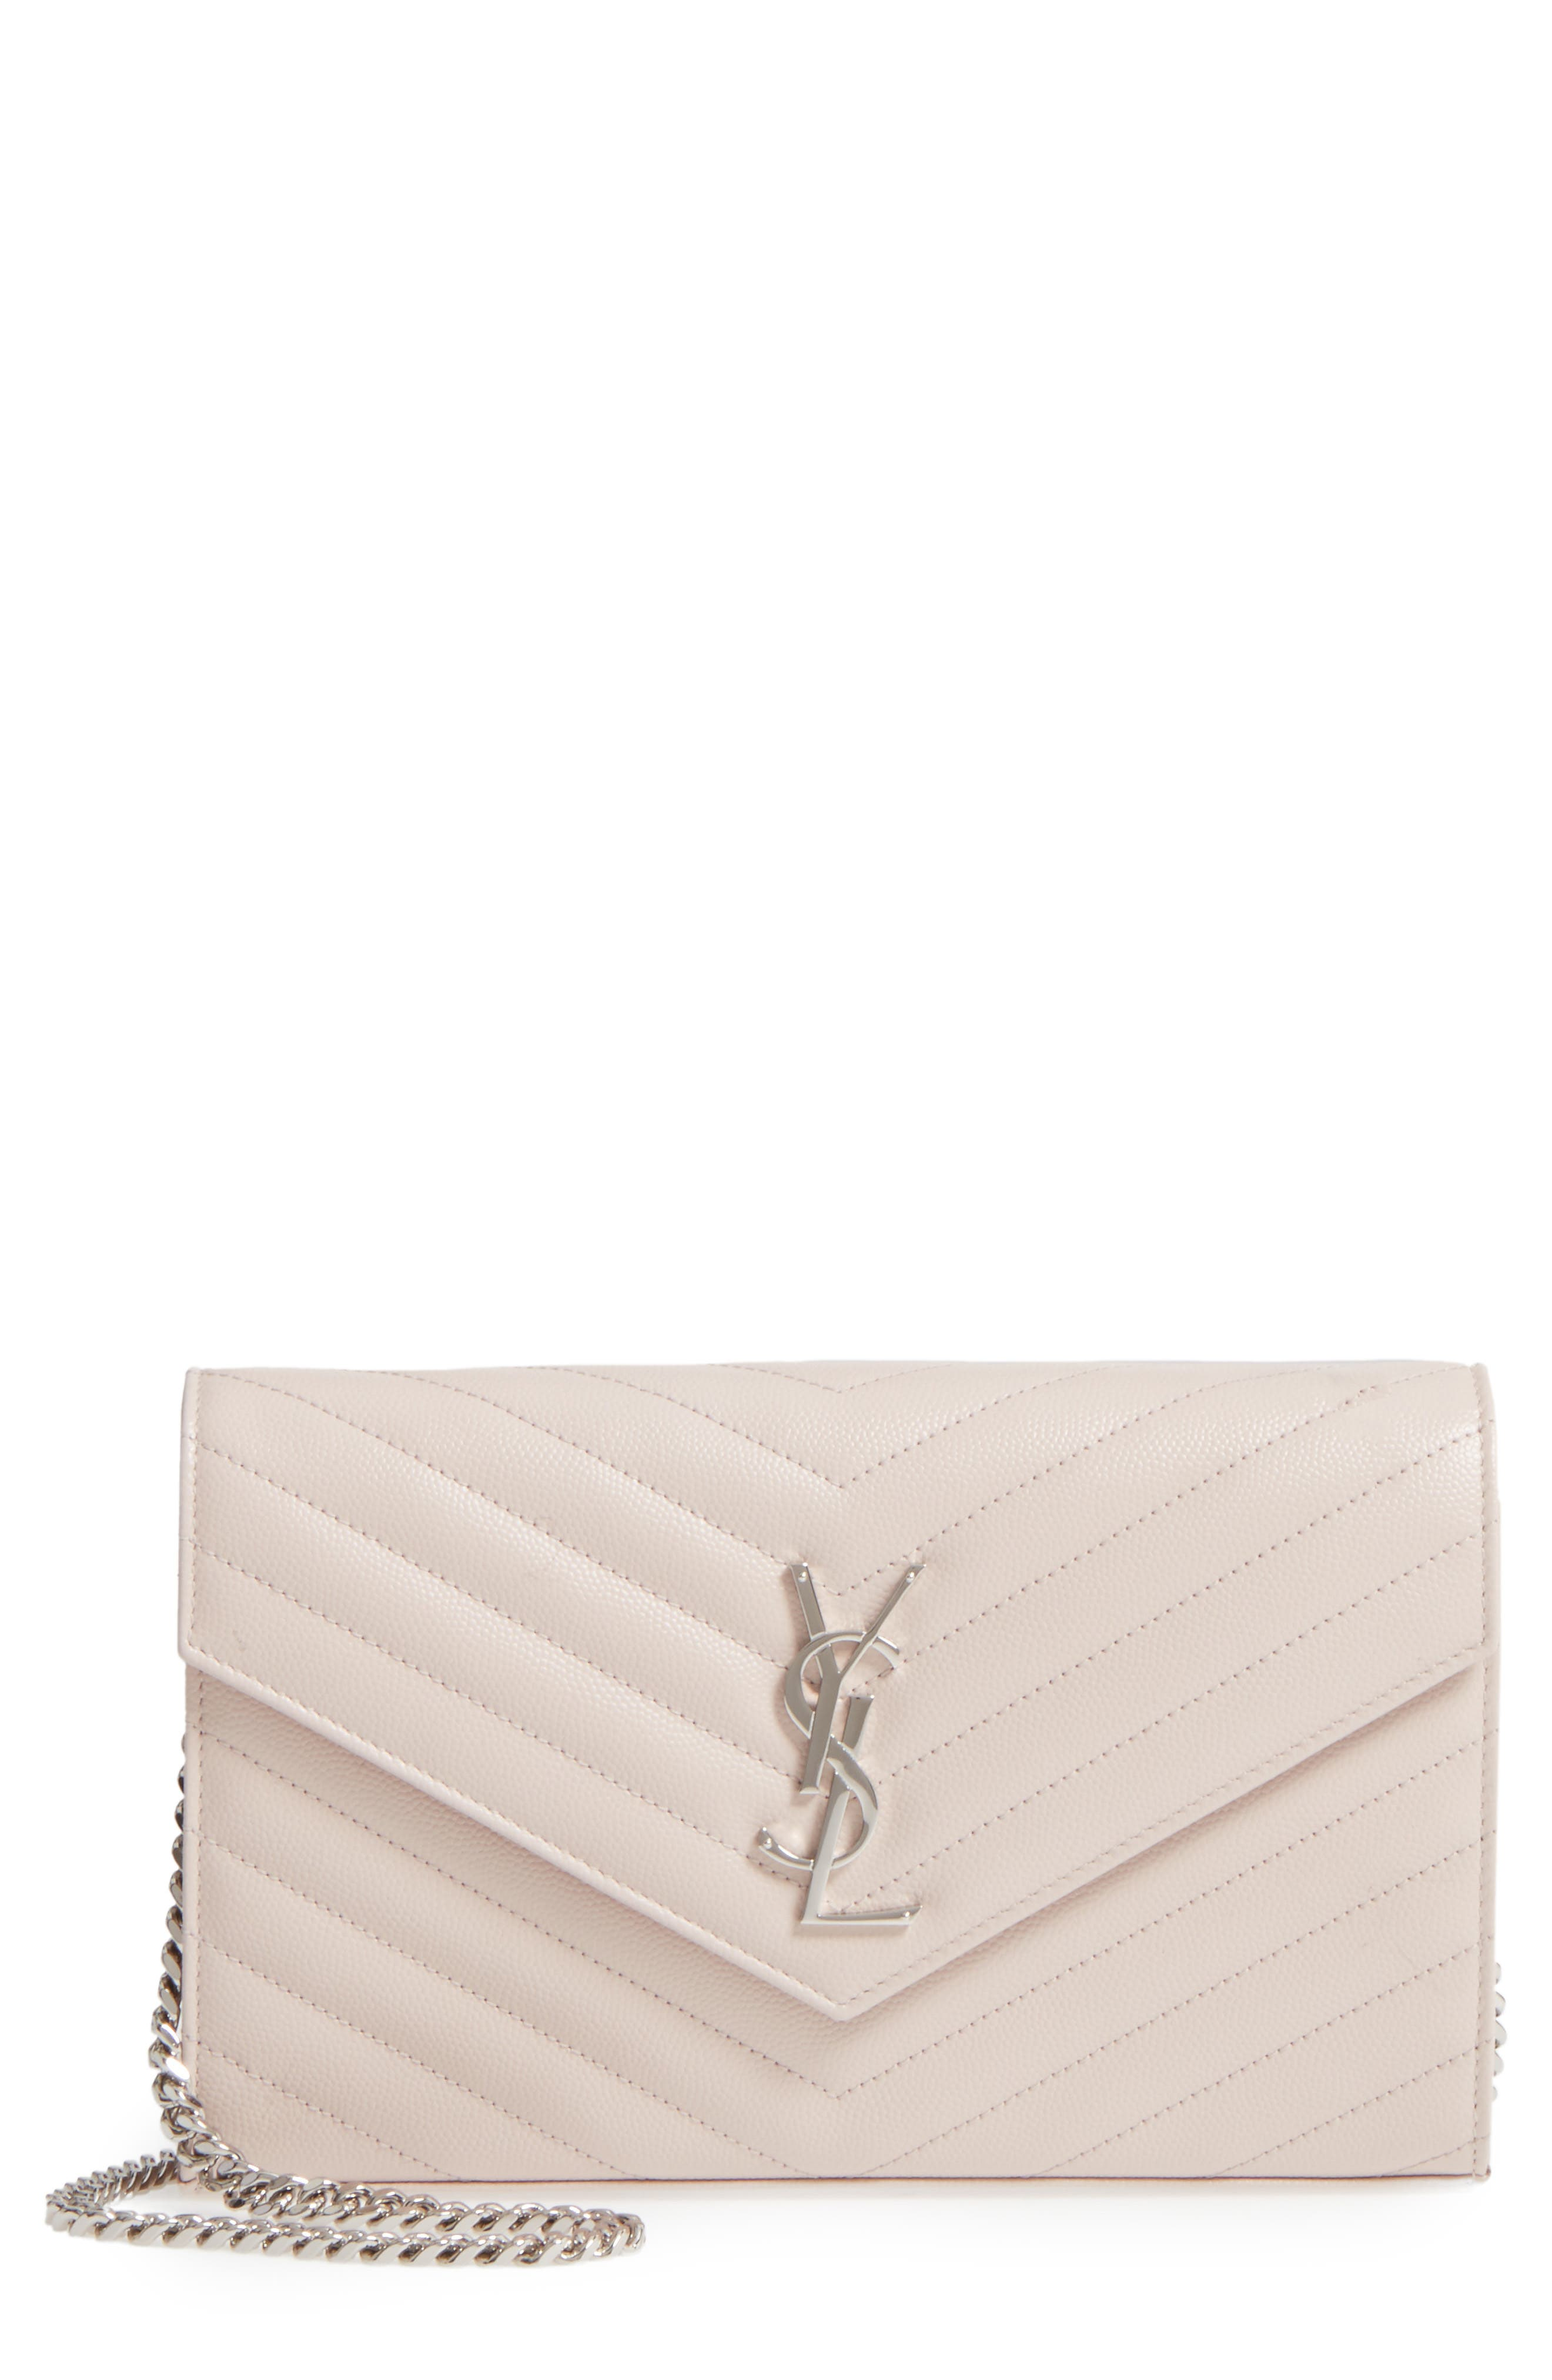 Alternate Image 1 Selected - Saint Laurent 'Monogram' Wallet on a Chain